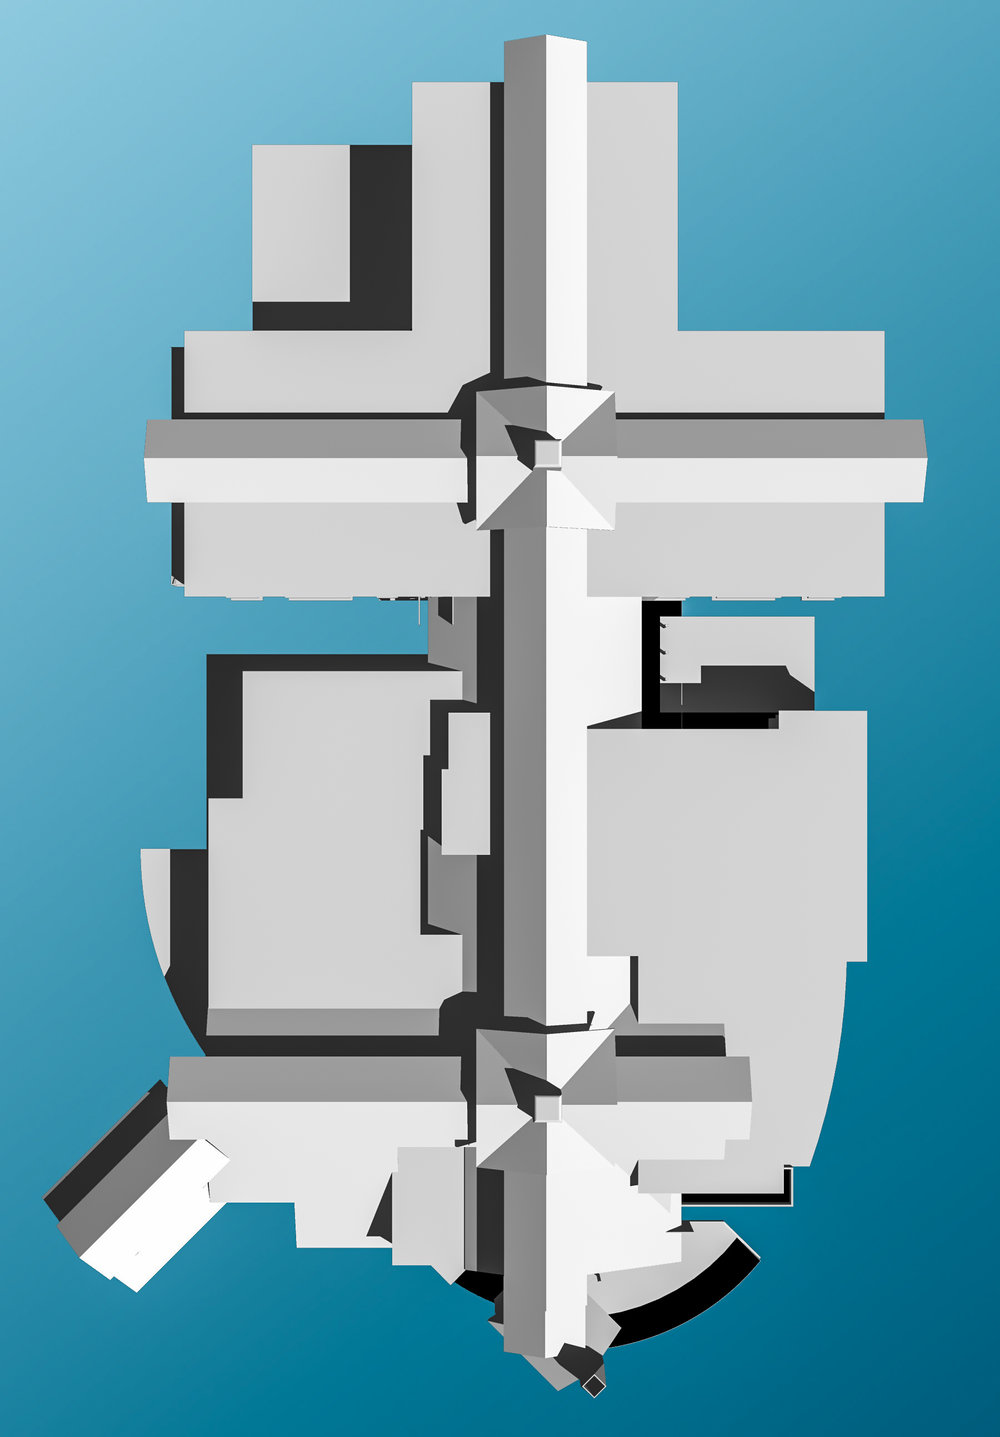 20000430-Mpsrcroof1bg.jpg